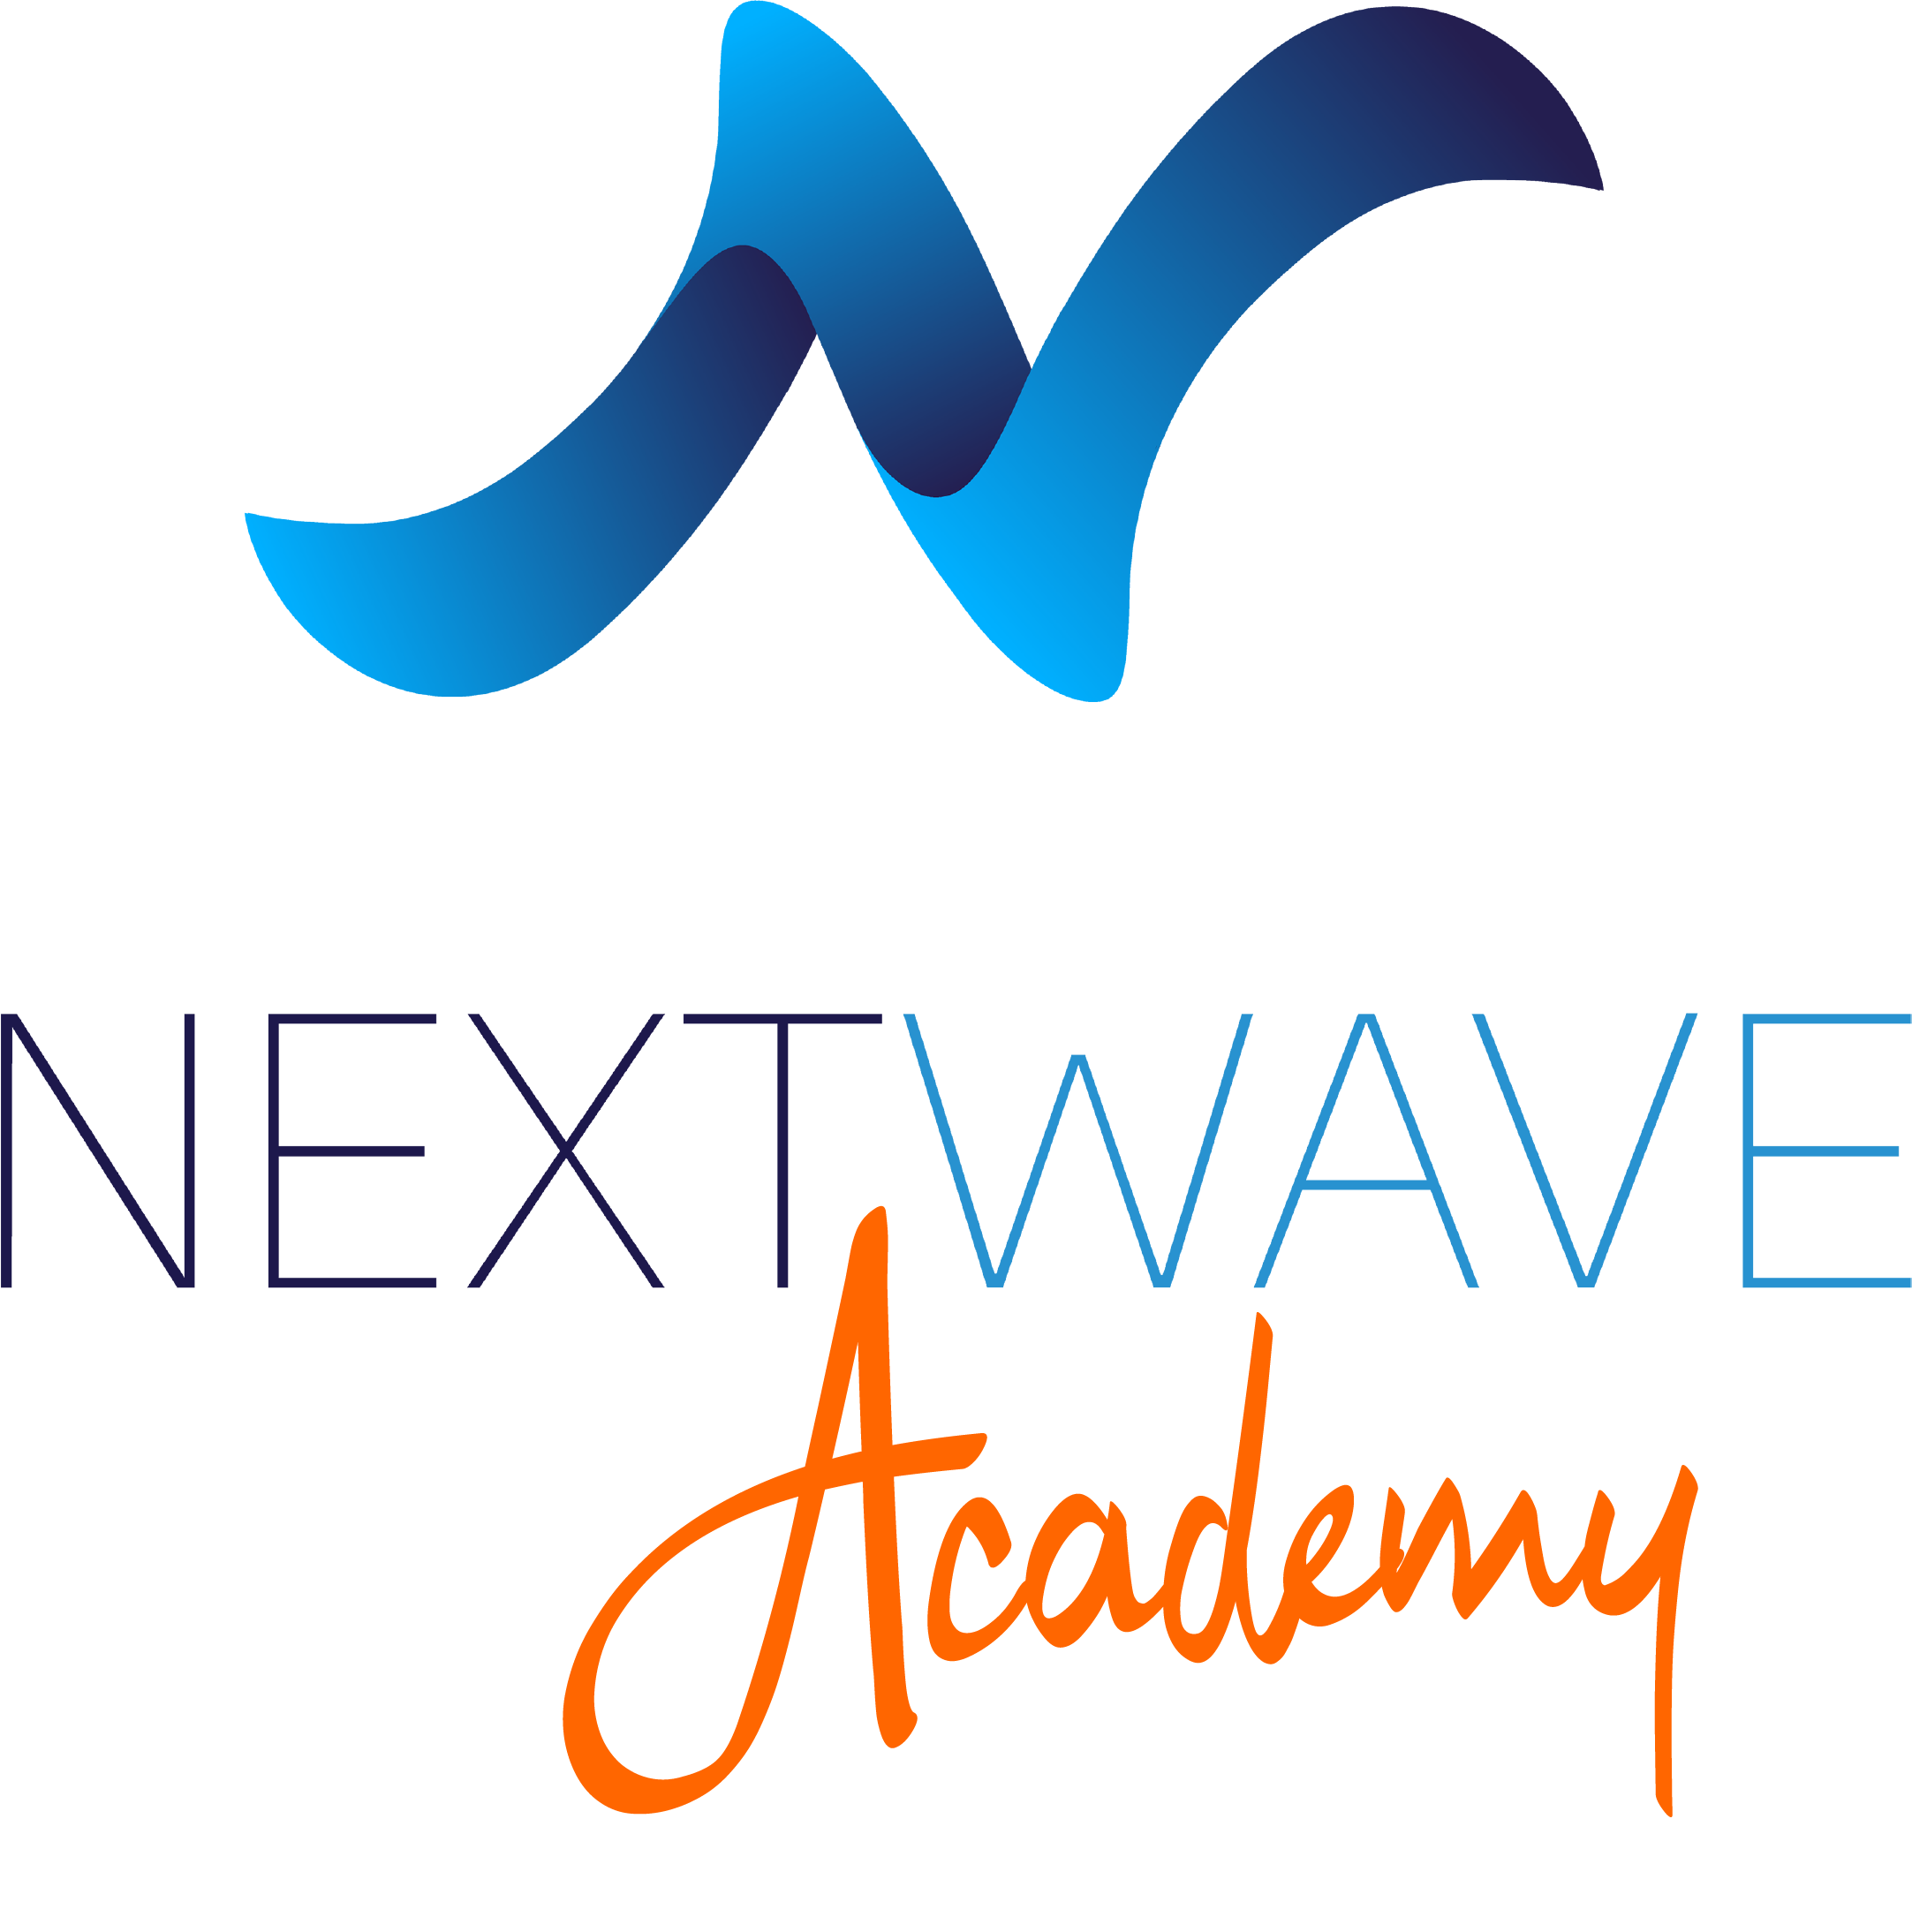 http://nextwavehellas.com/wp-content/uploads/2020/10/Academy.png